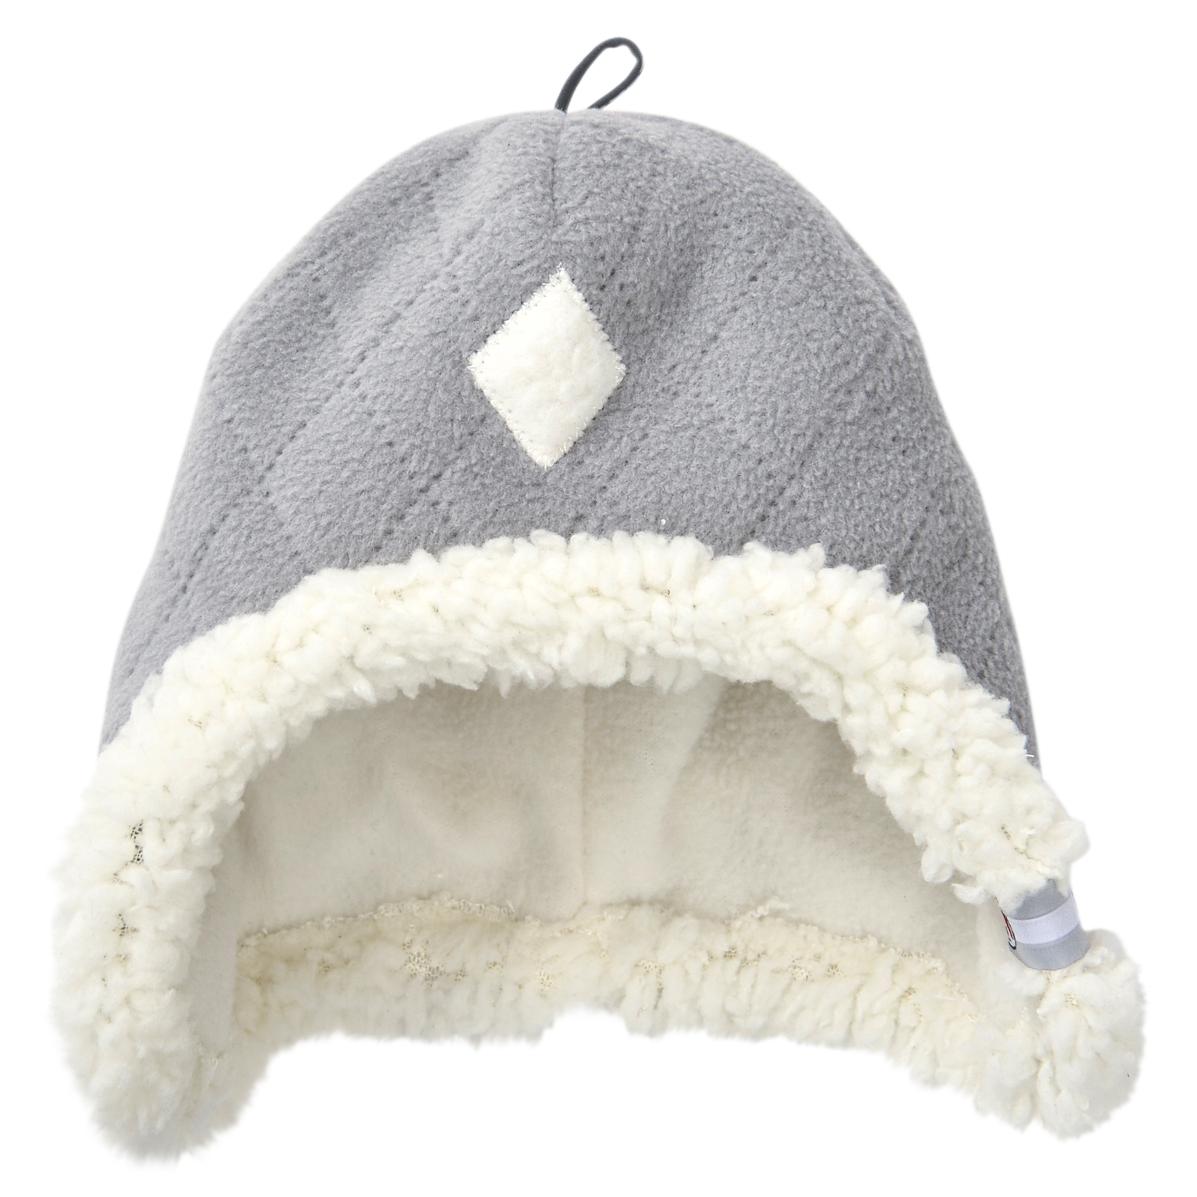 Lodger Hatter Fleece Scandinavian cepure, 6-12 mēn., Greige HT 504_6-12 bērnu ietinamā sedziņa